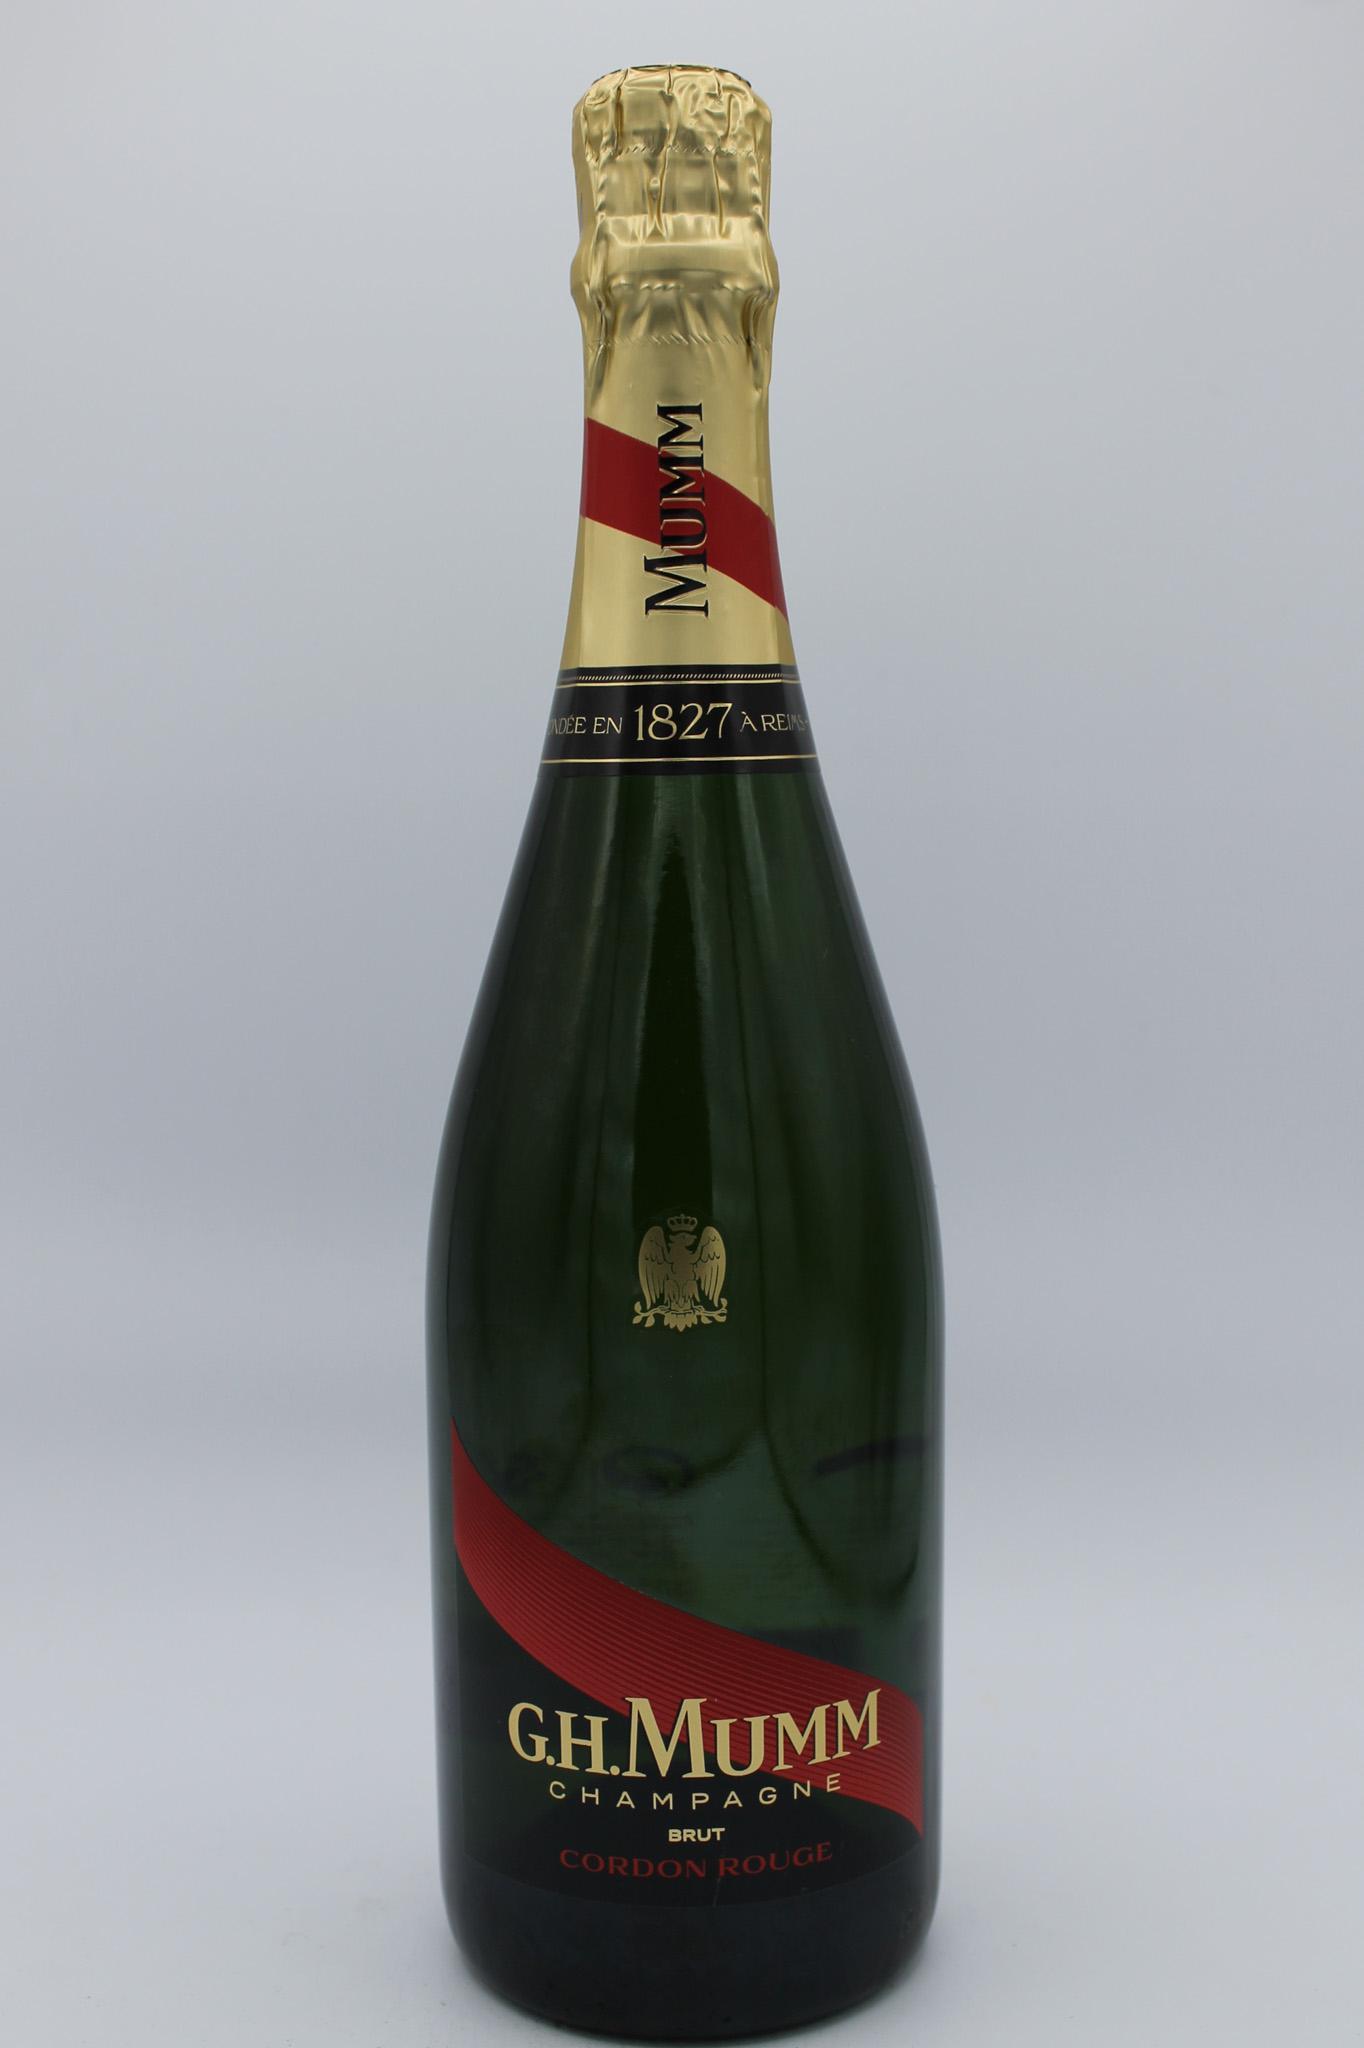 G.H. Mumm champagne brut 750ml.